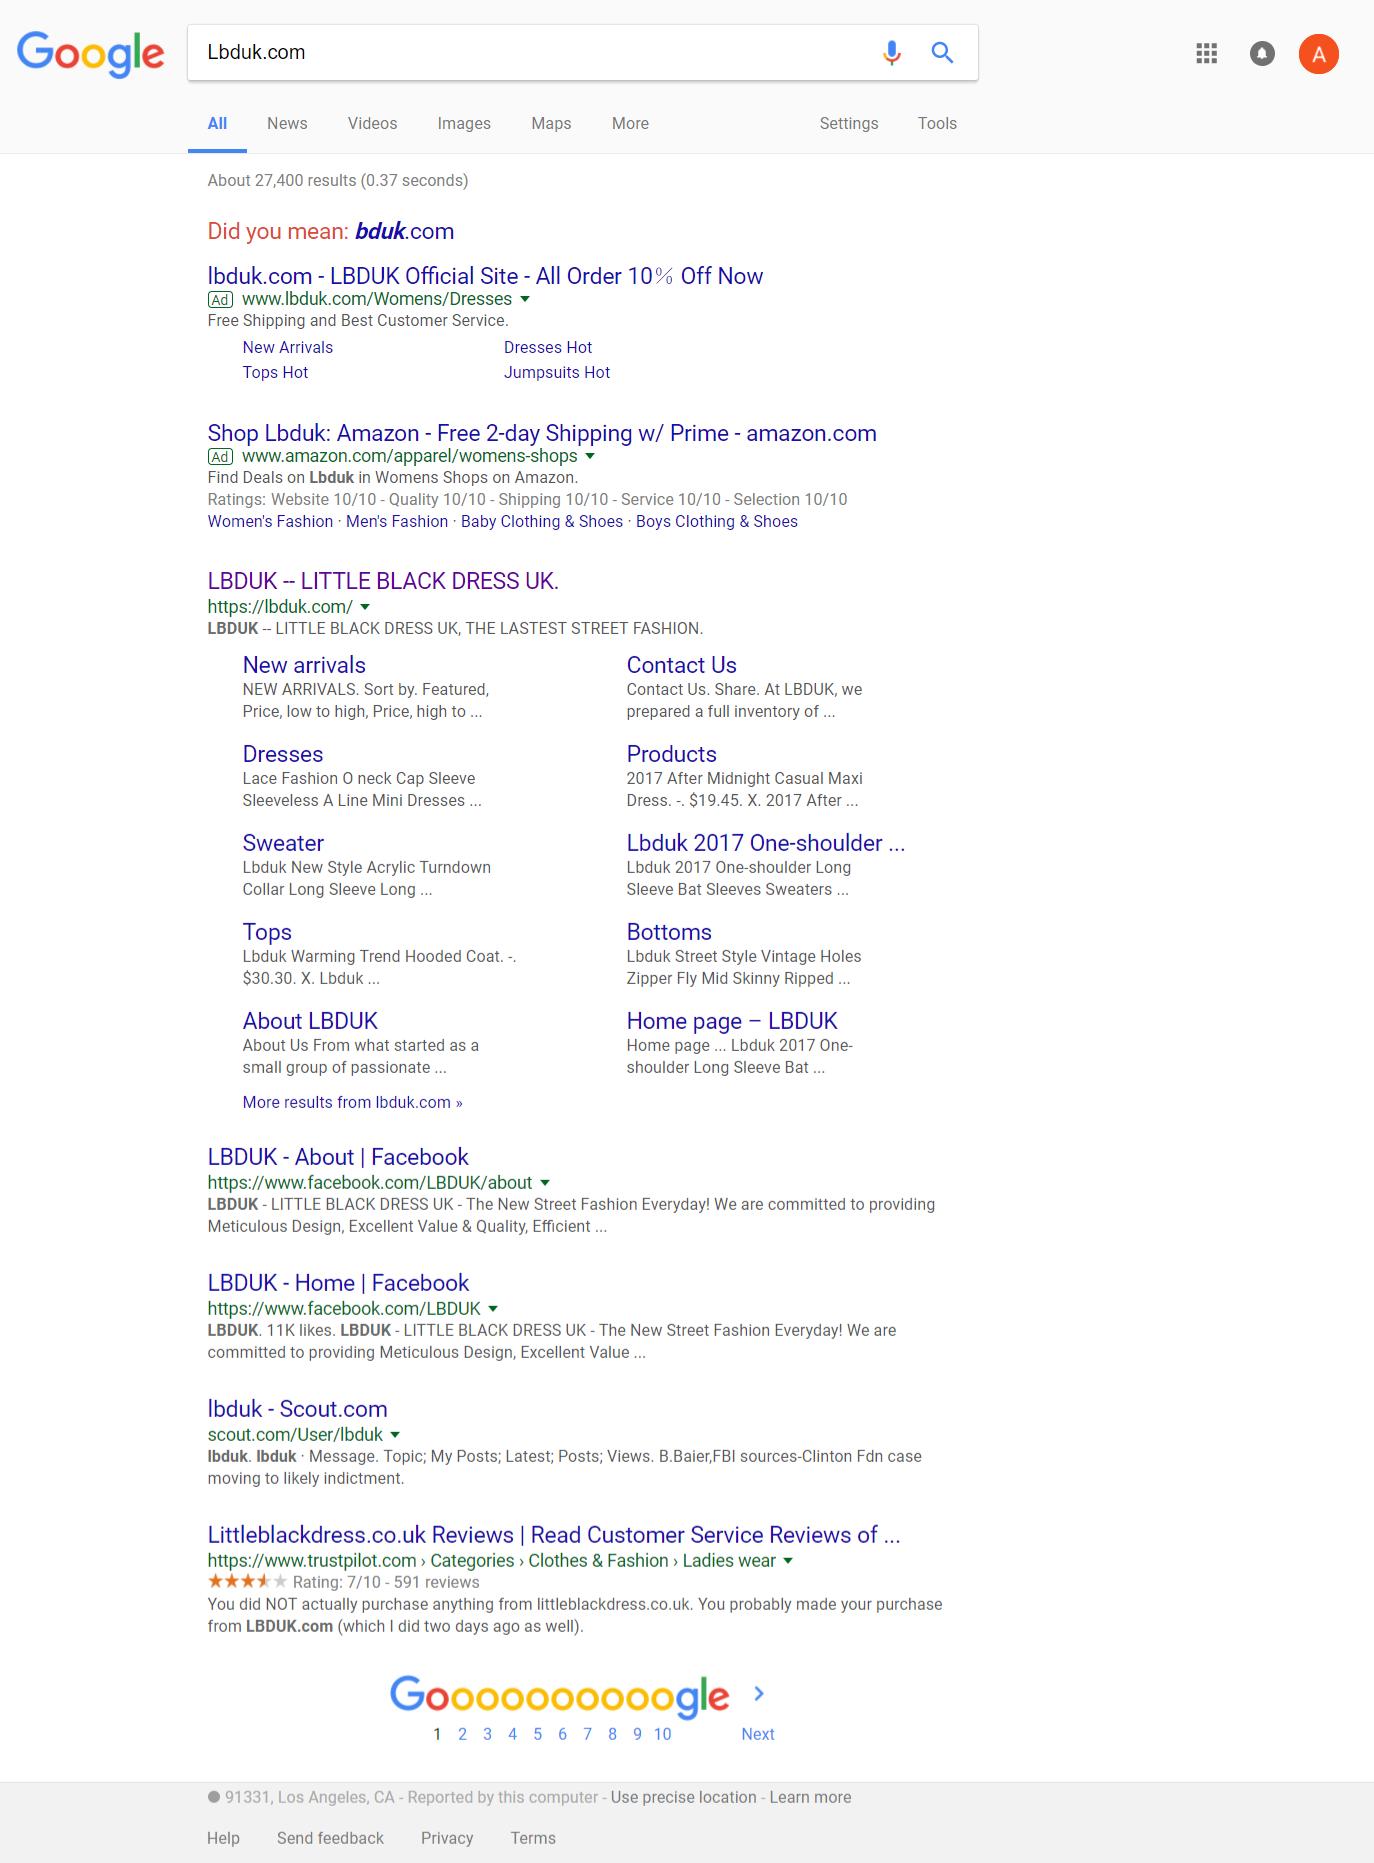 screencapture-google-search-1509824528156